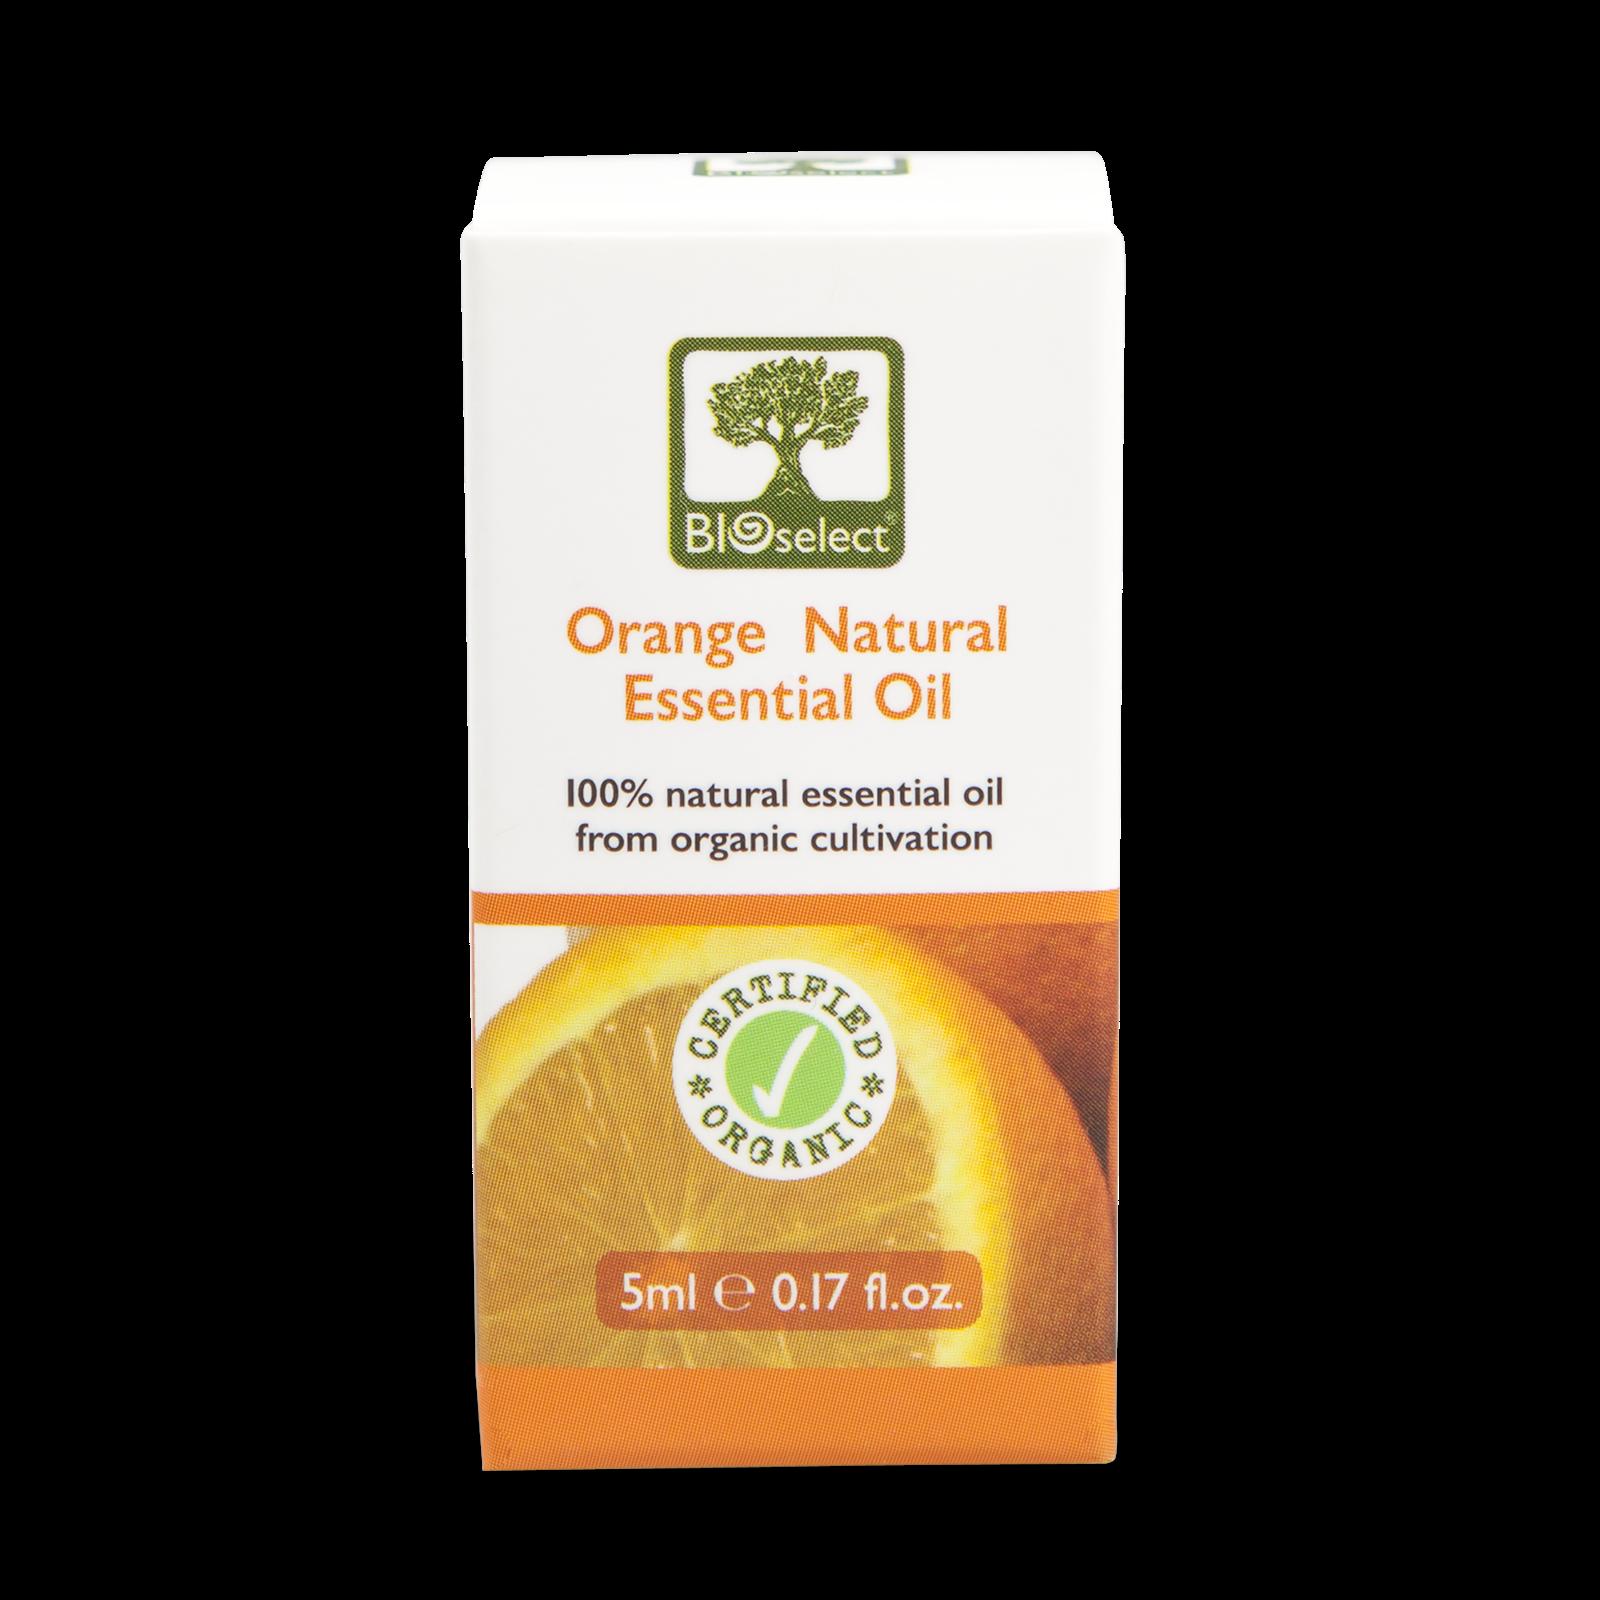 Bioselect Orange Natural Essential Oil Certified Organic